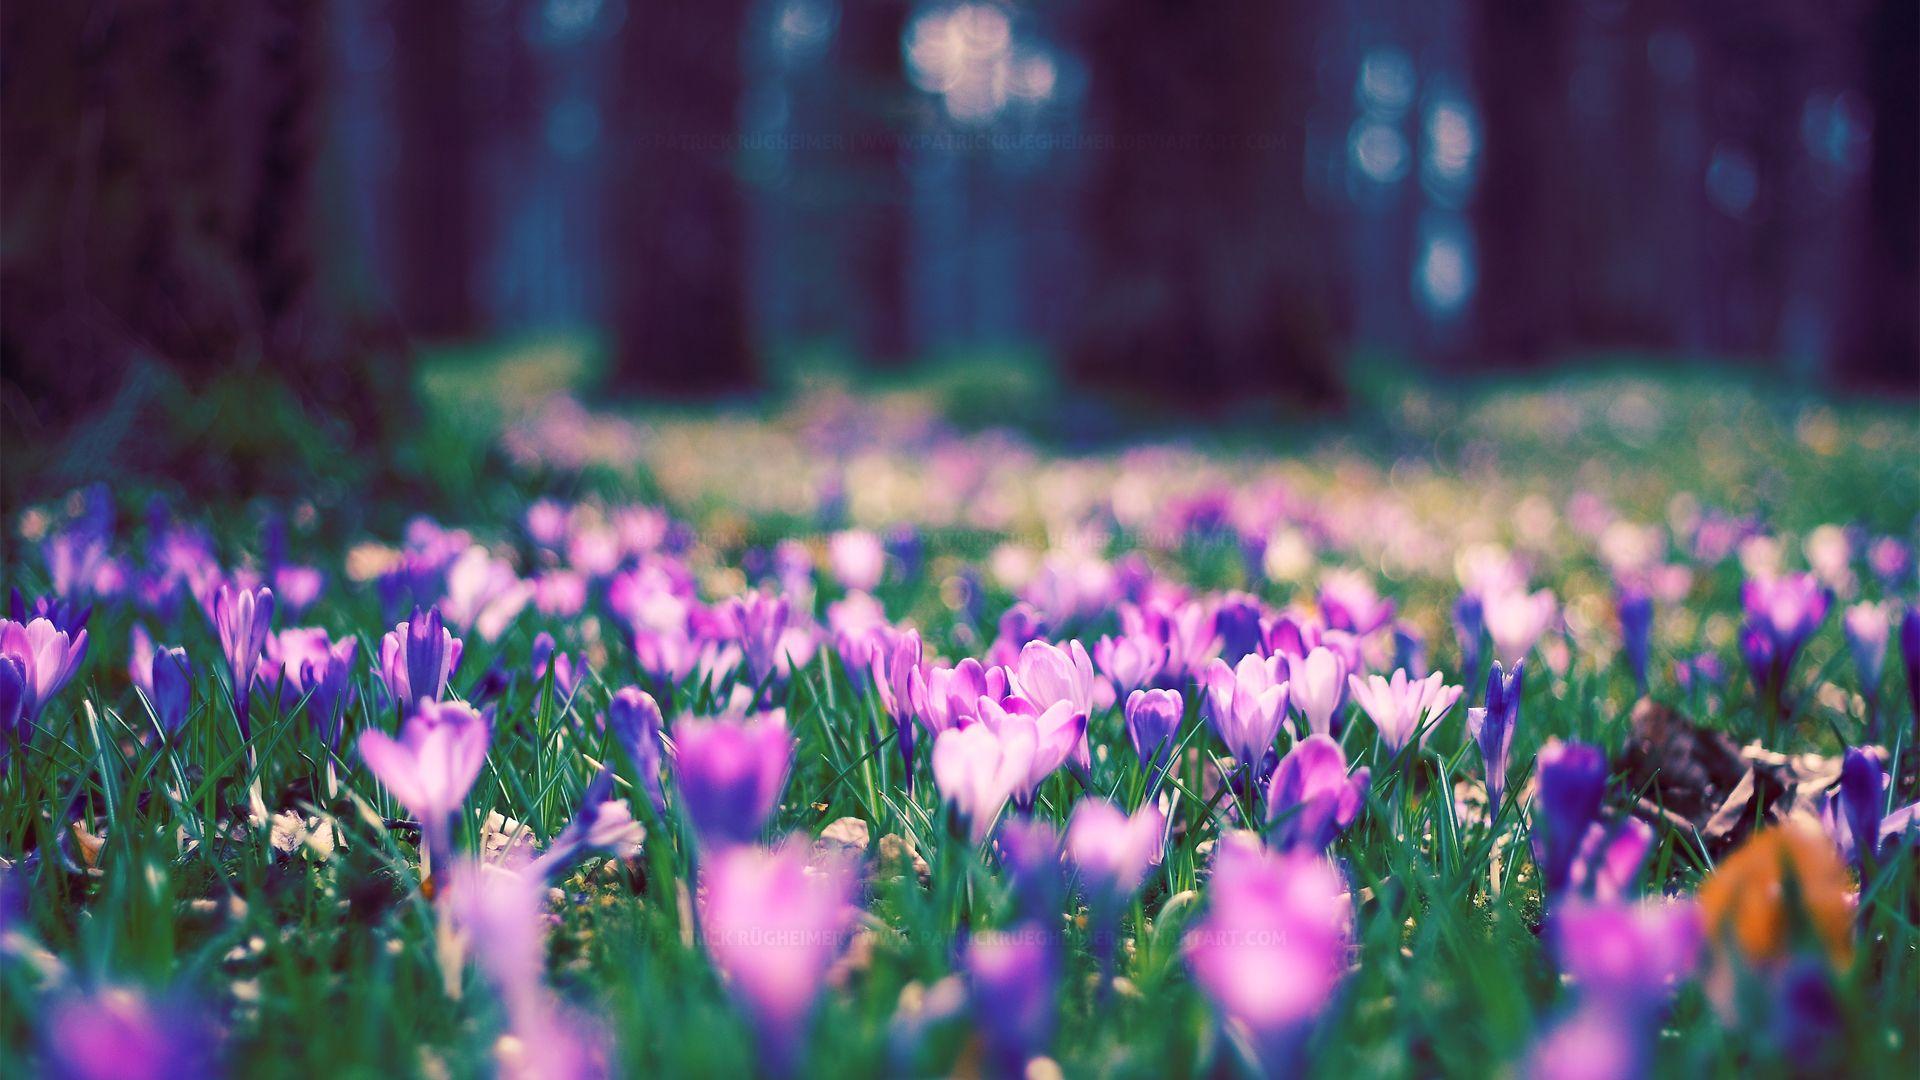 Foretaste of Spring HD Wallpaper